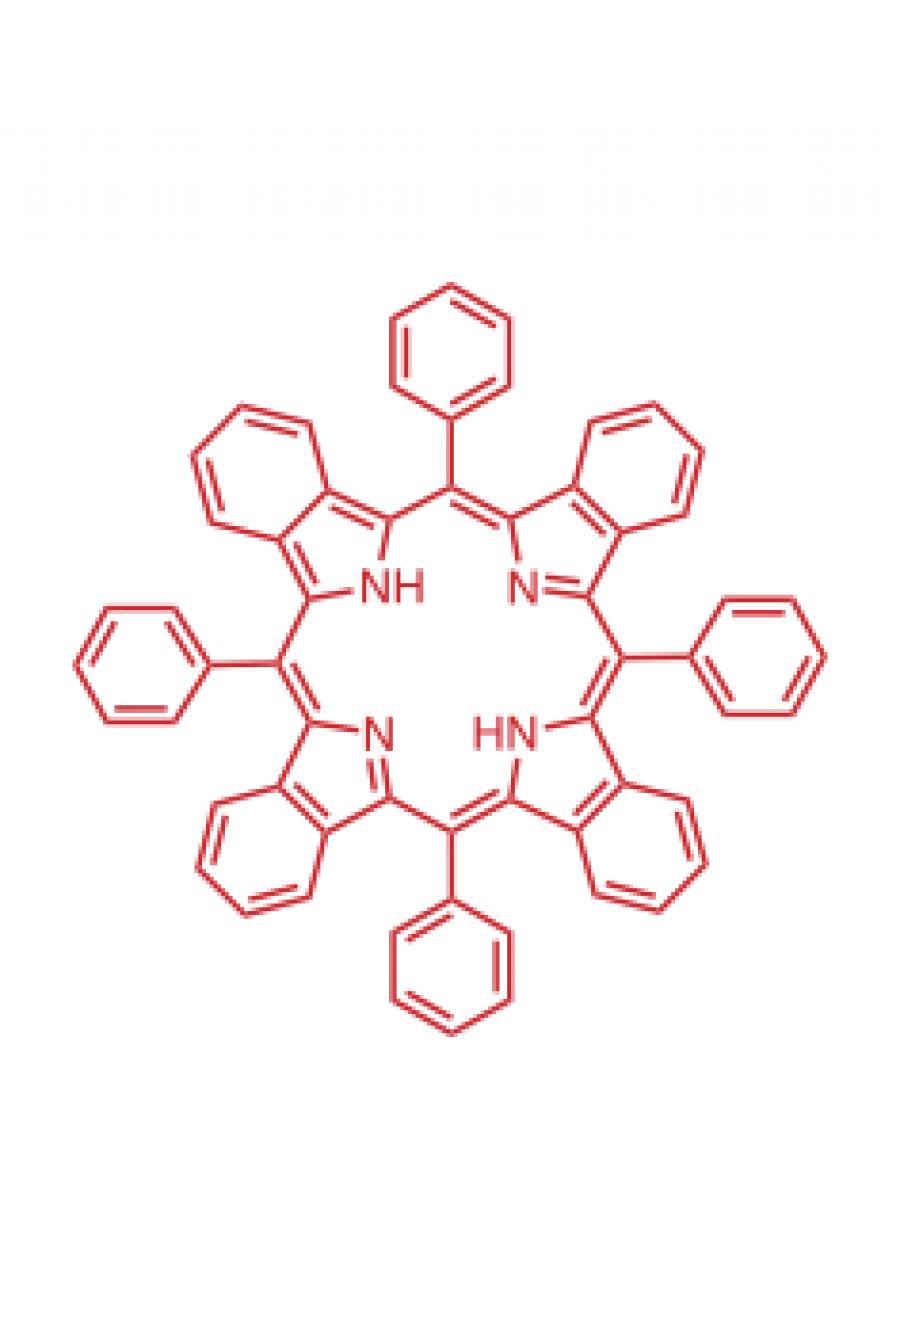 5,10,15,20-(tetraphenyl)tetrabenzoporphyrin